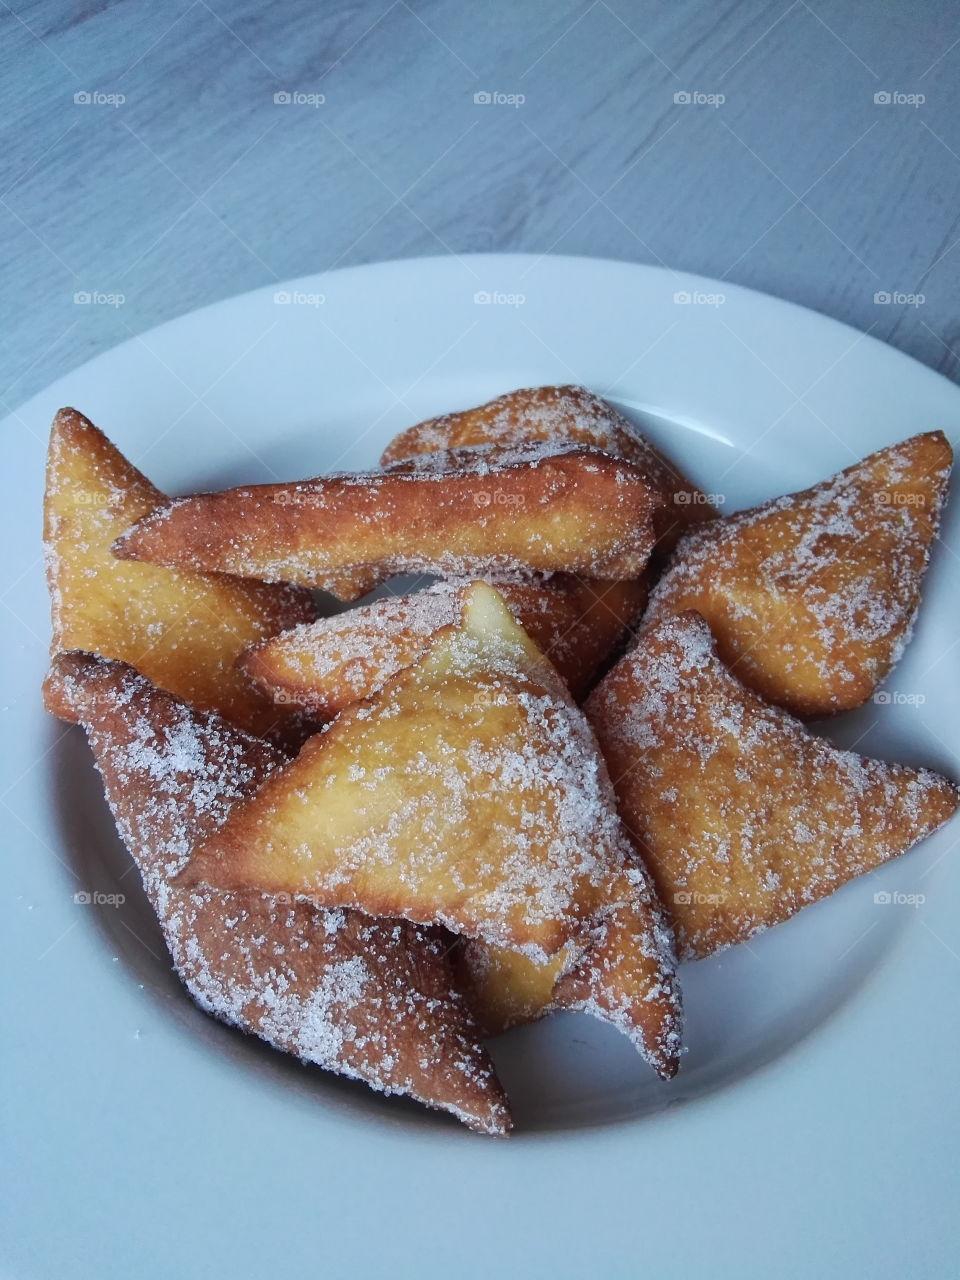 frish homemade sweet doughnuts